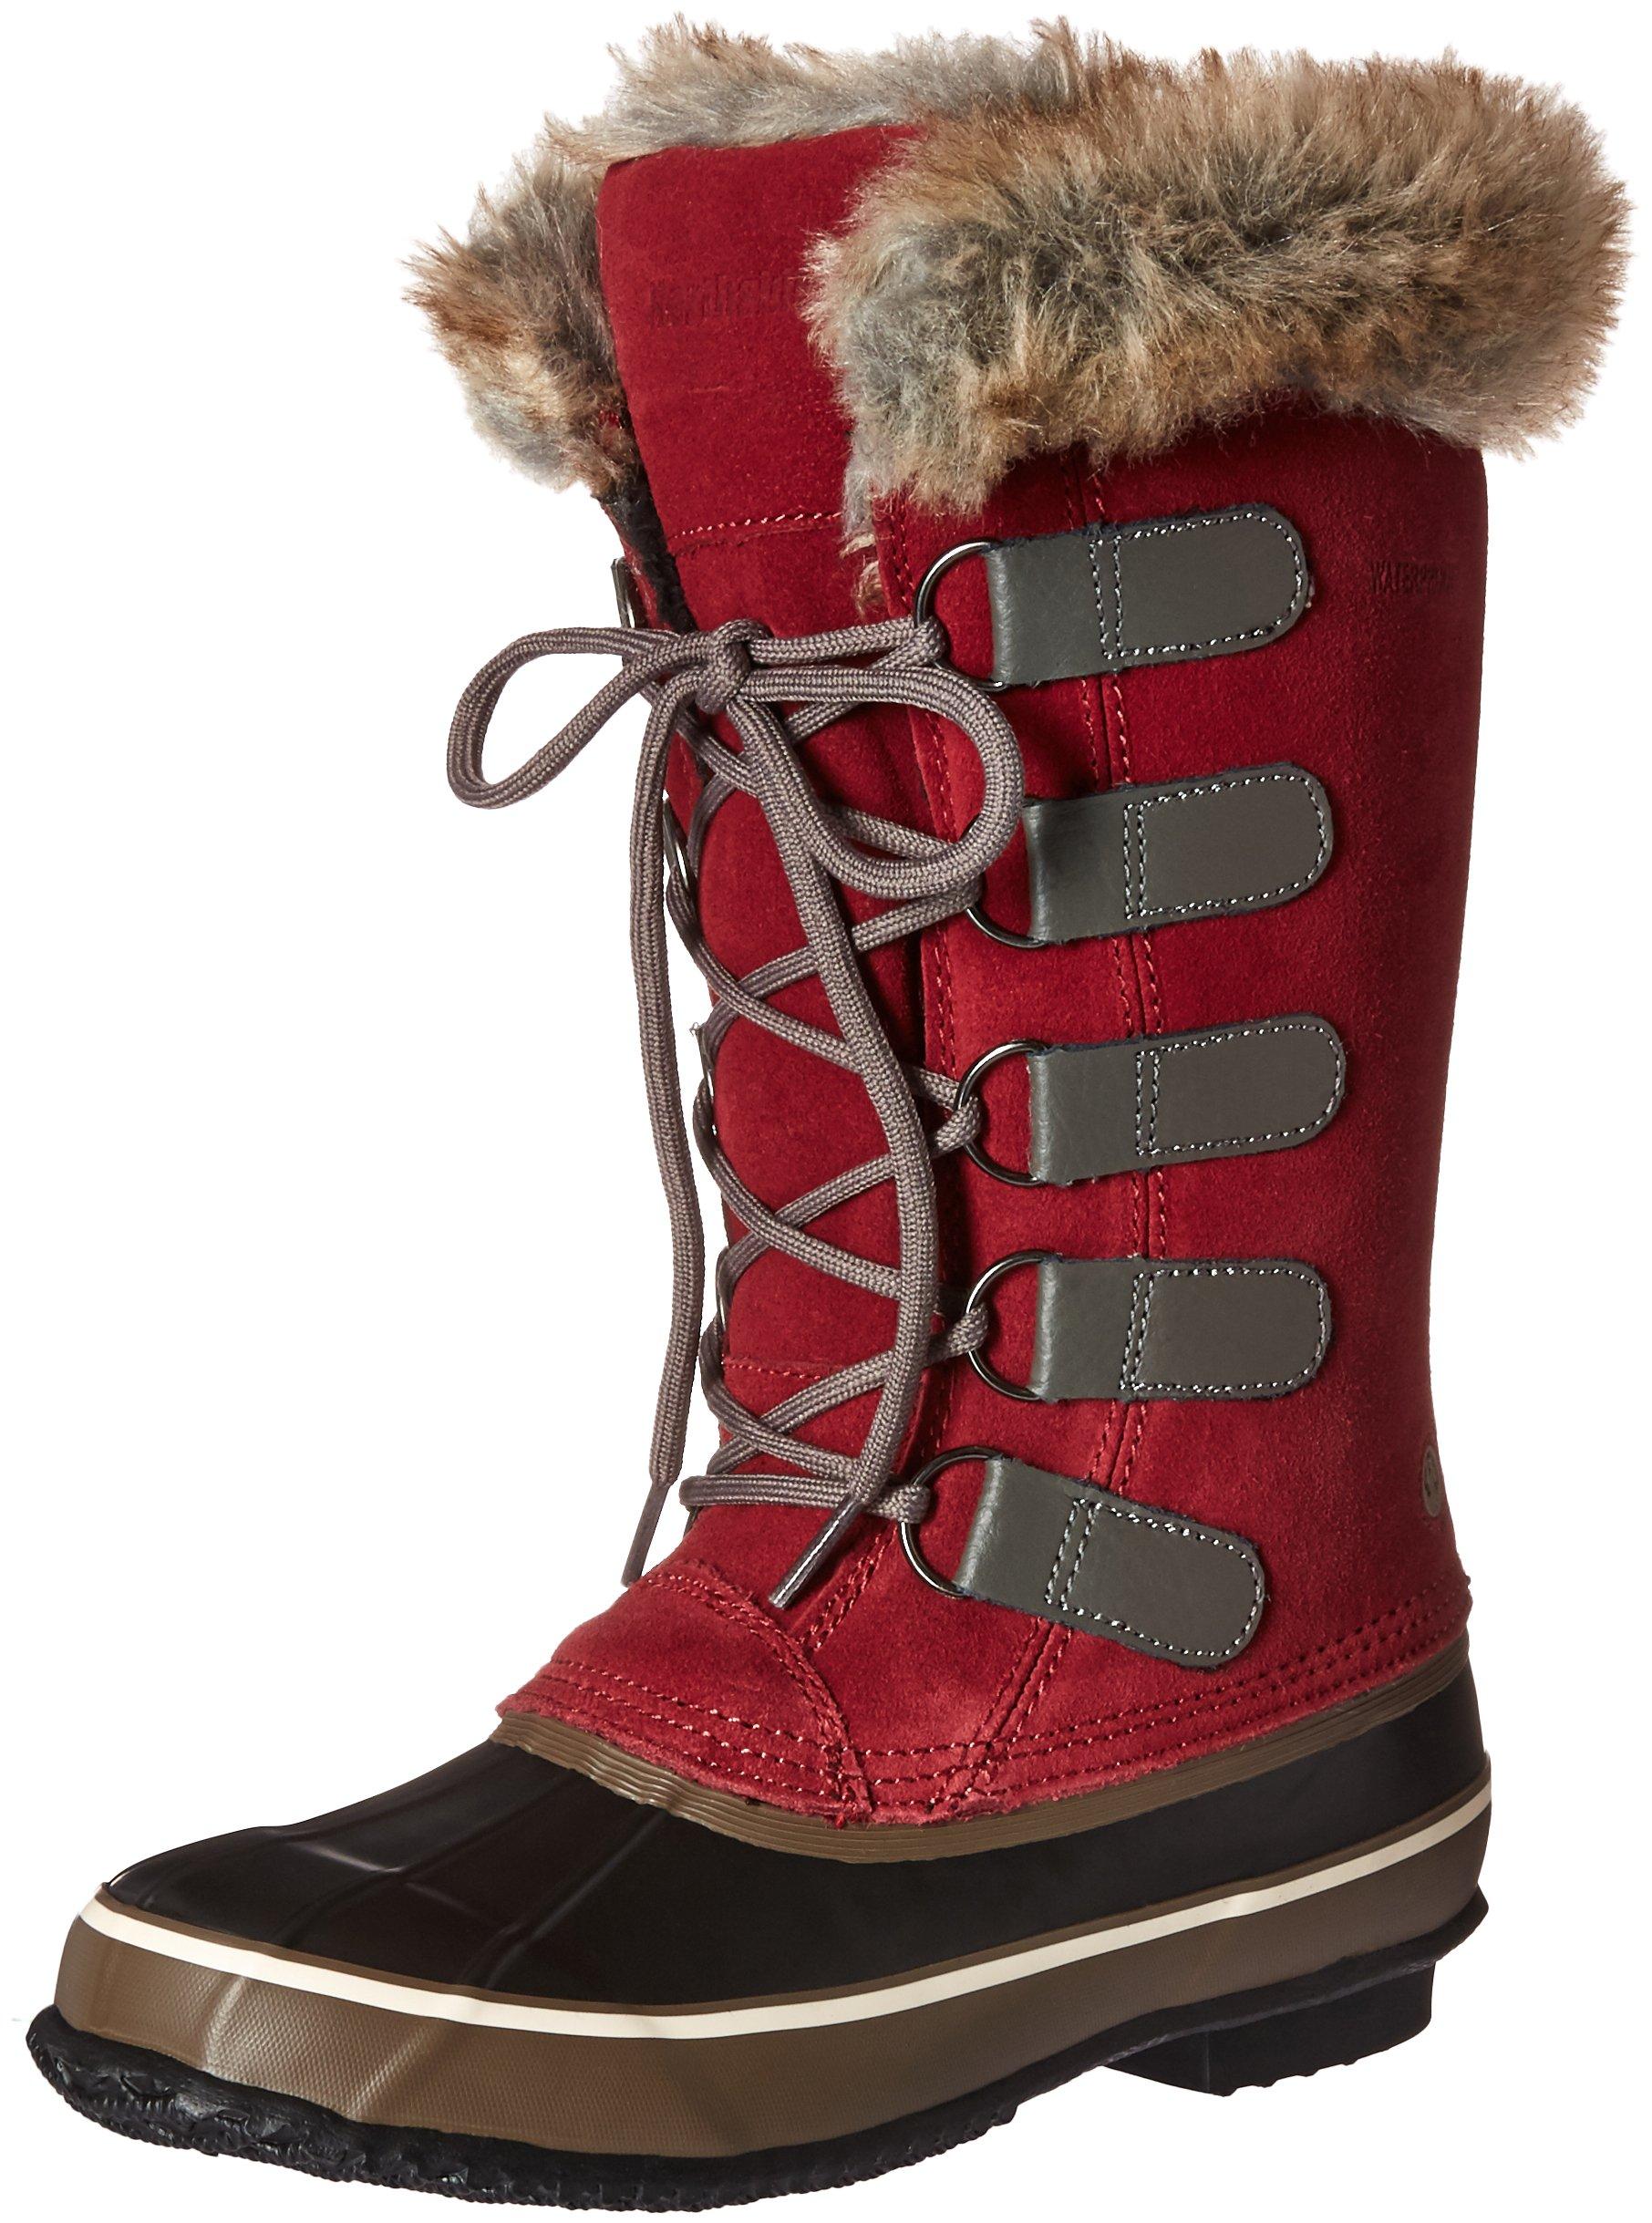 Northside Women's Kathmandu Snow Boot, Marsala Black, 7 M US